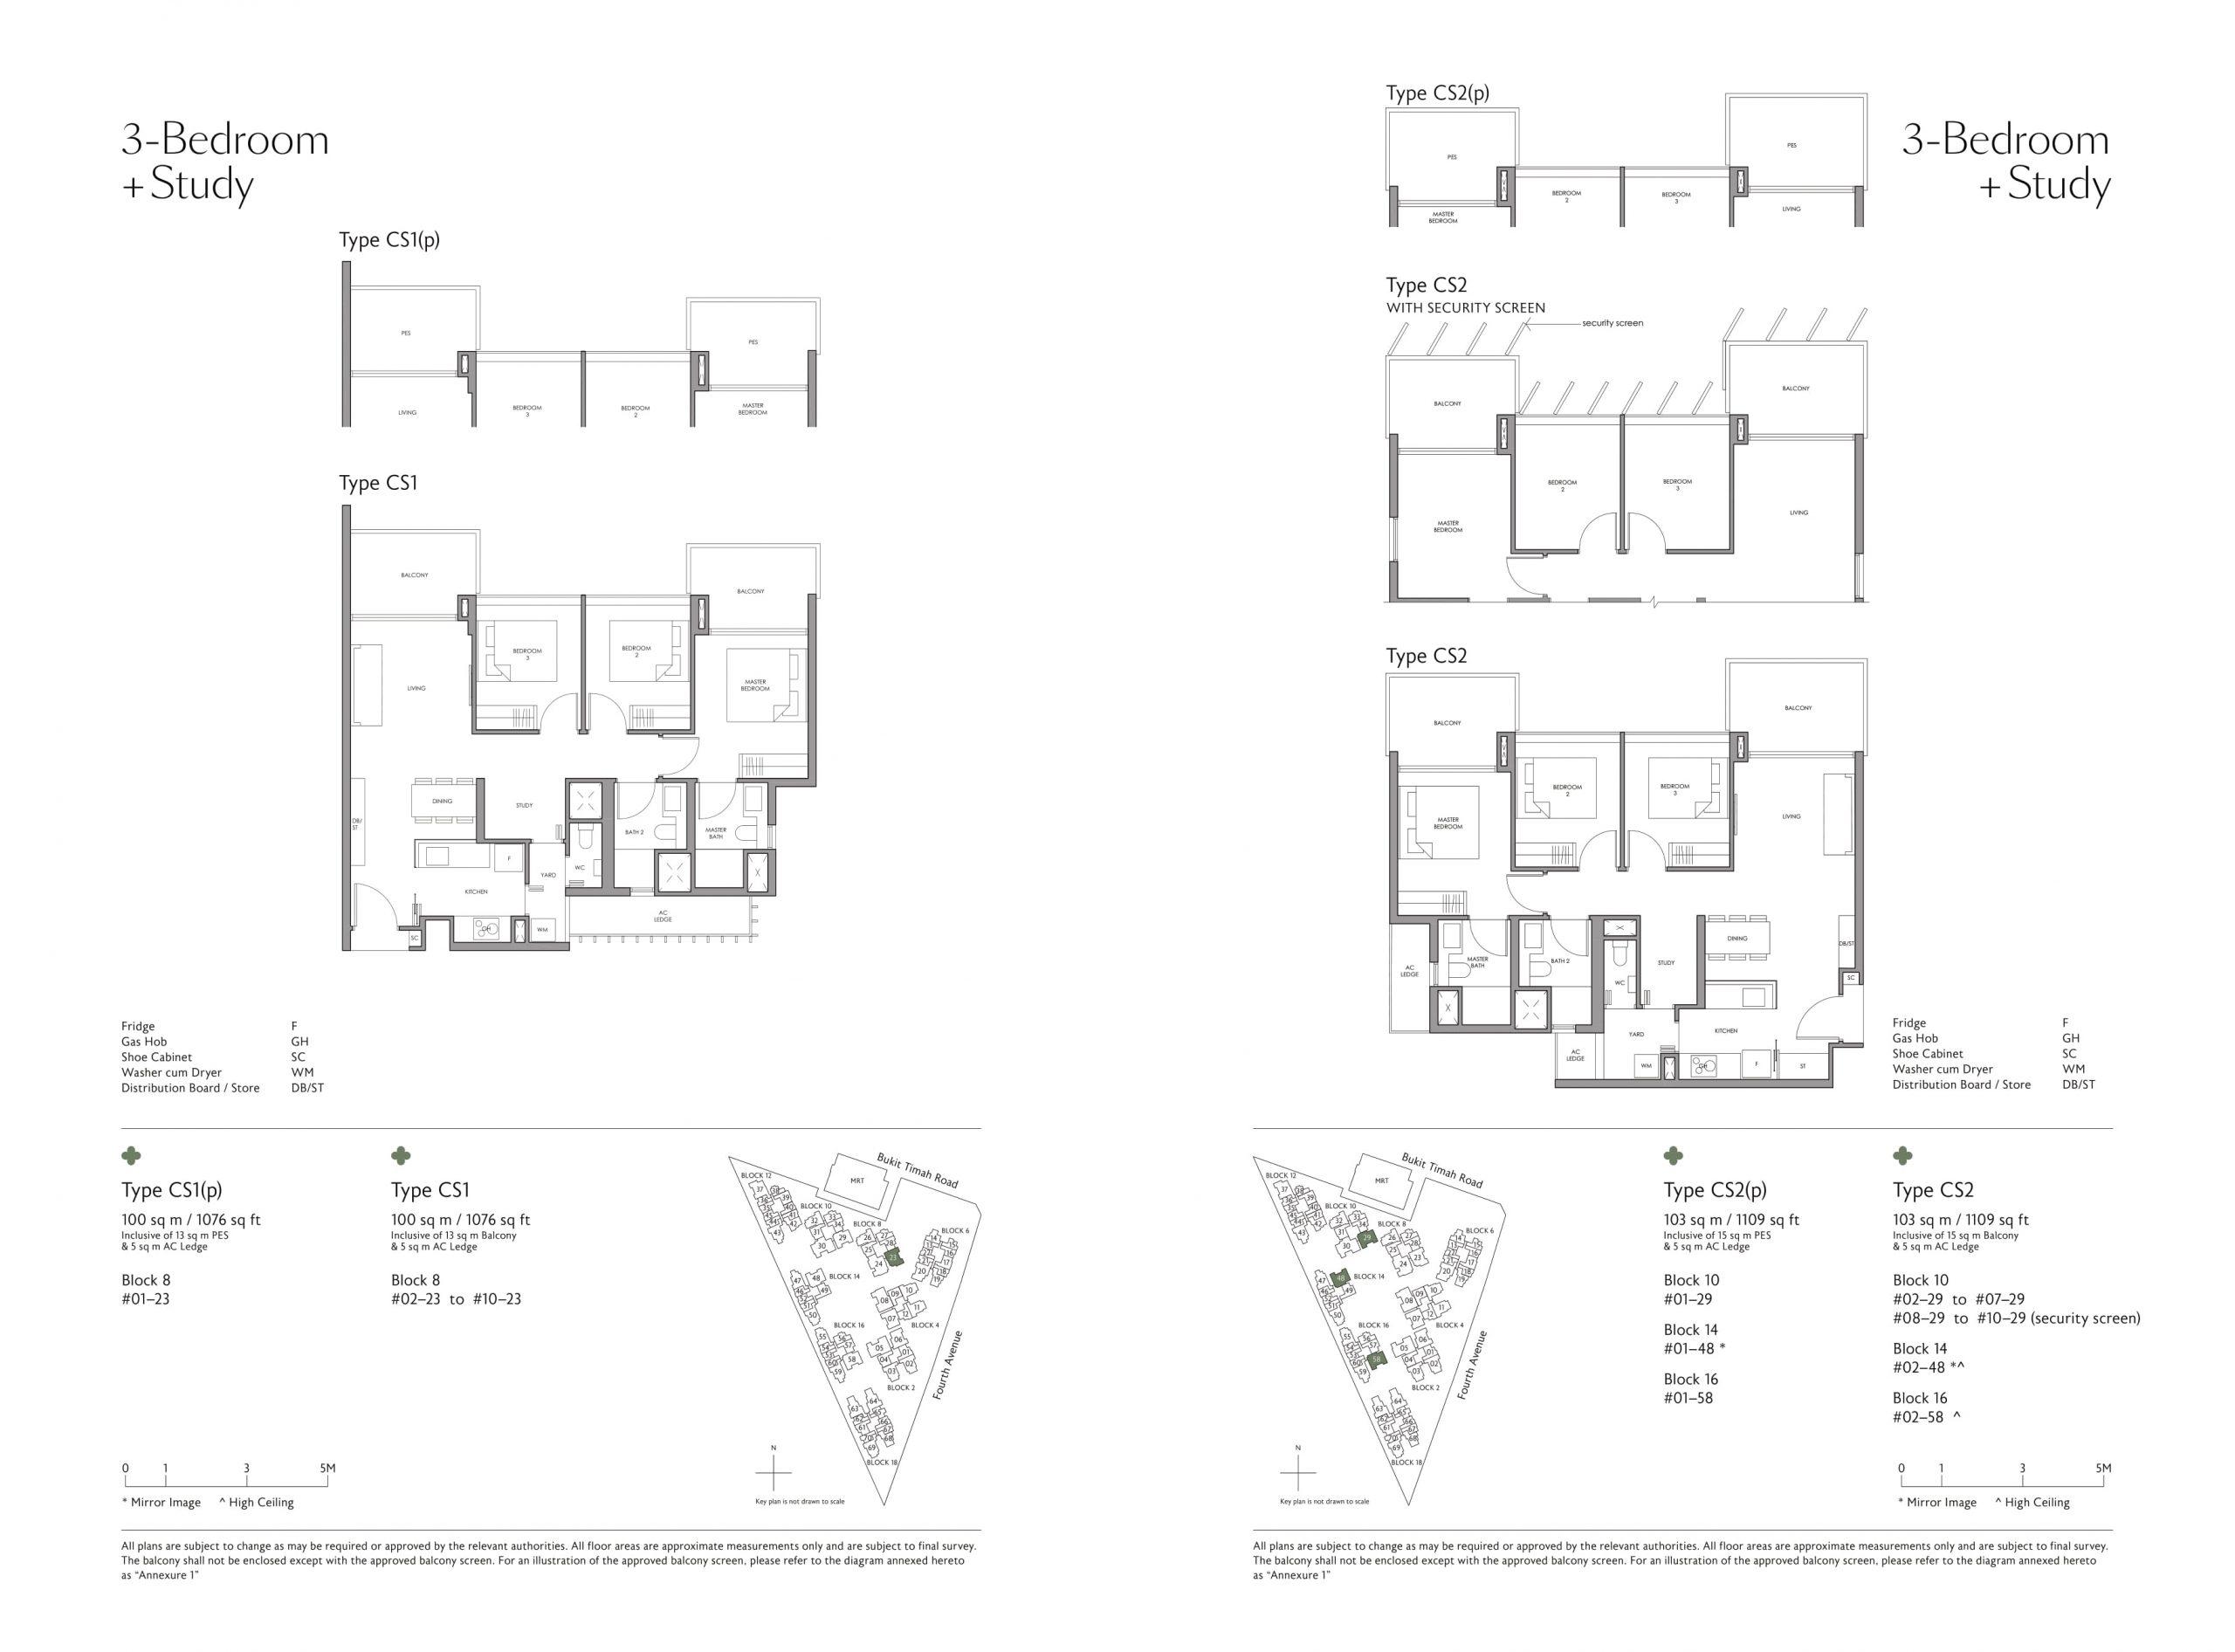 Fourth Avenue Residences' three-bedroom + study types